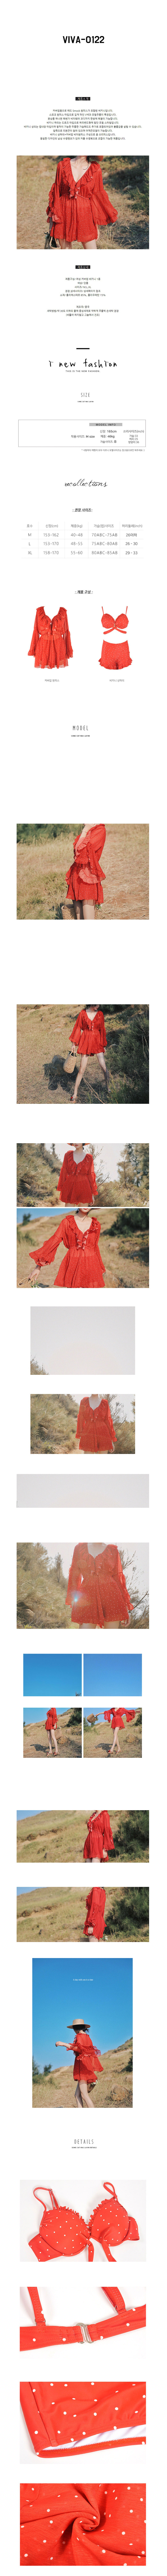 O122 셔링도트 여성 여름 원피스 수영복 - 익스트리모, 71,000원, 수영복/래쉬가드, 수영복